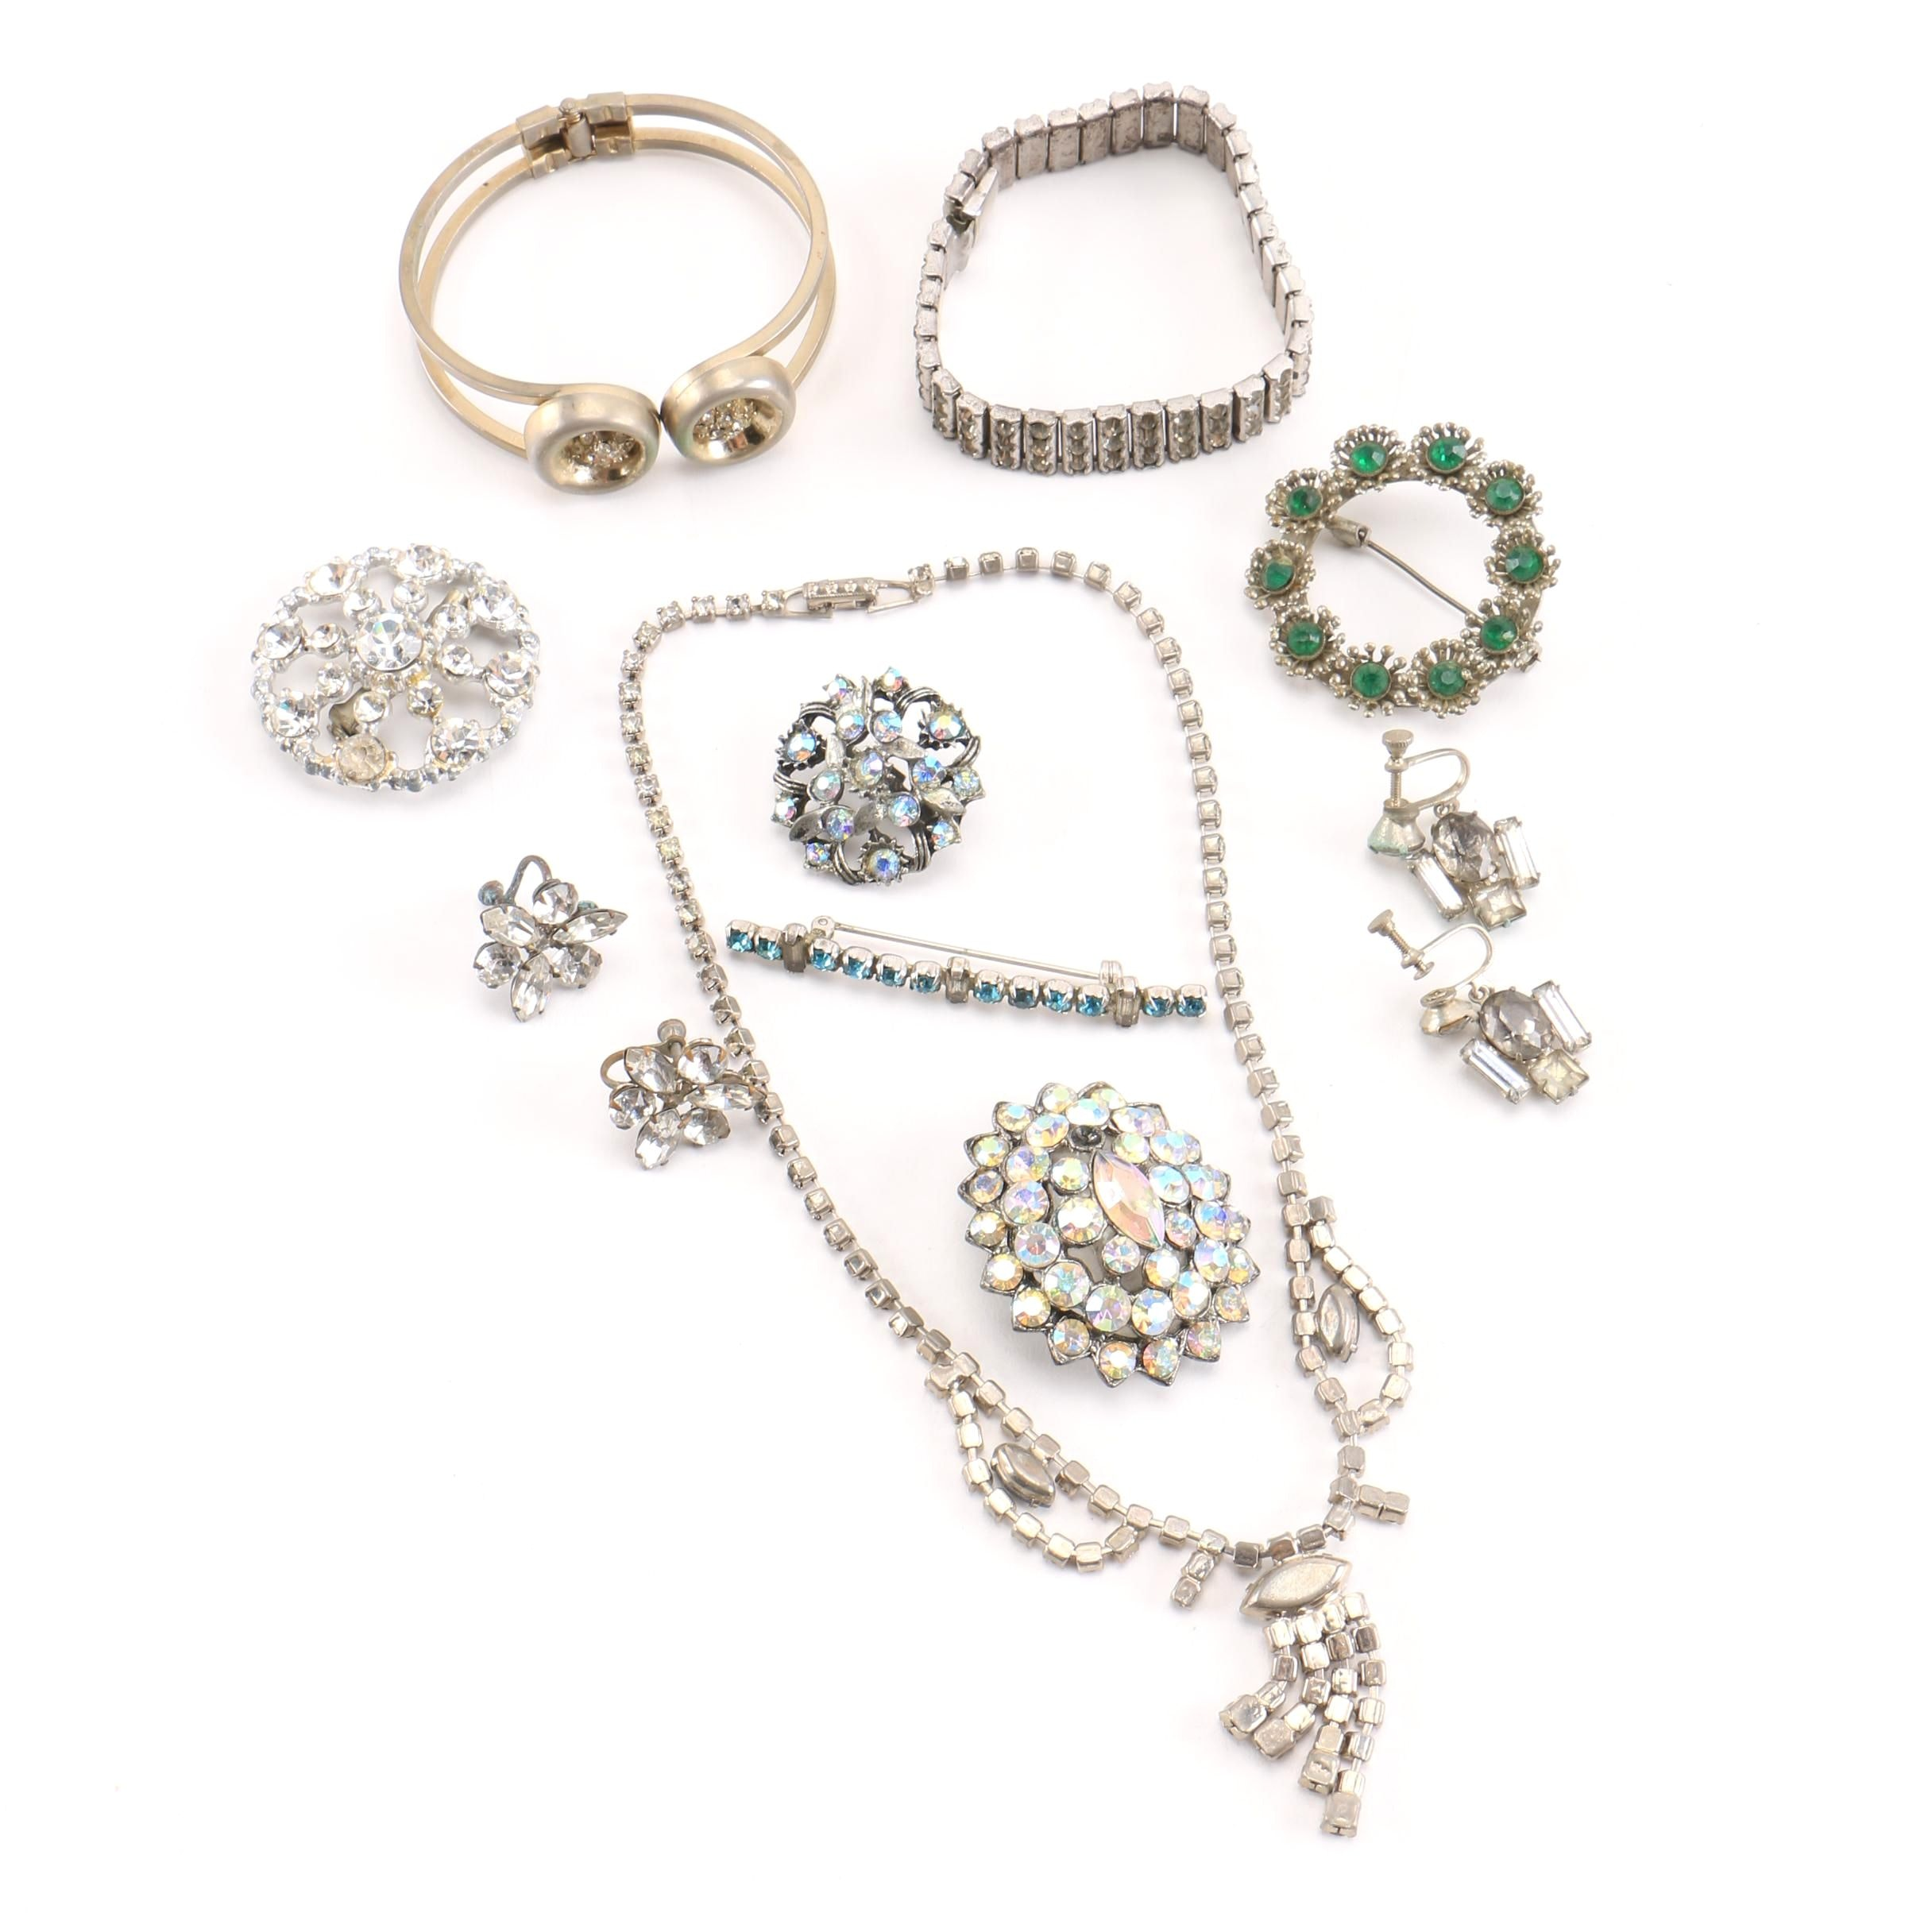 Assorted Vintage Rhinestone Jewelry